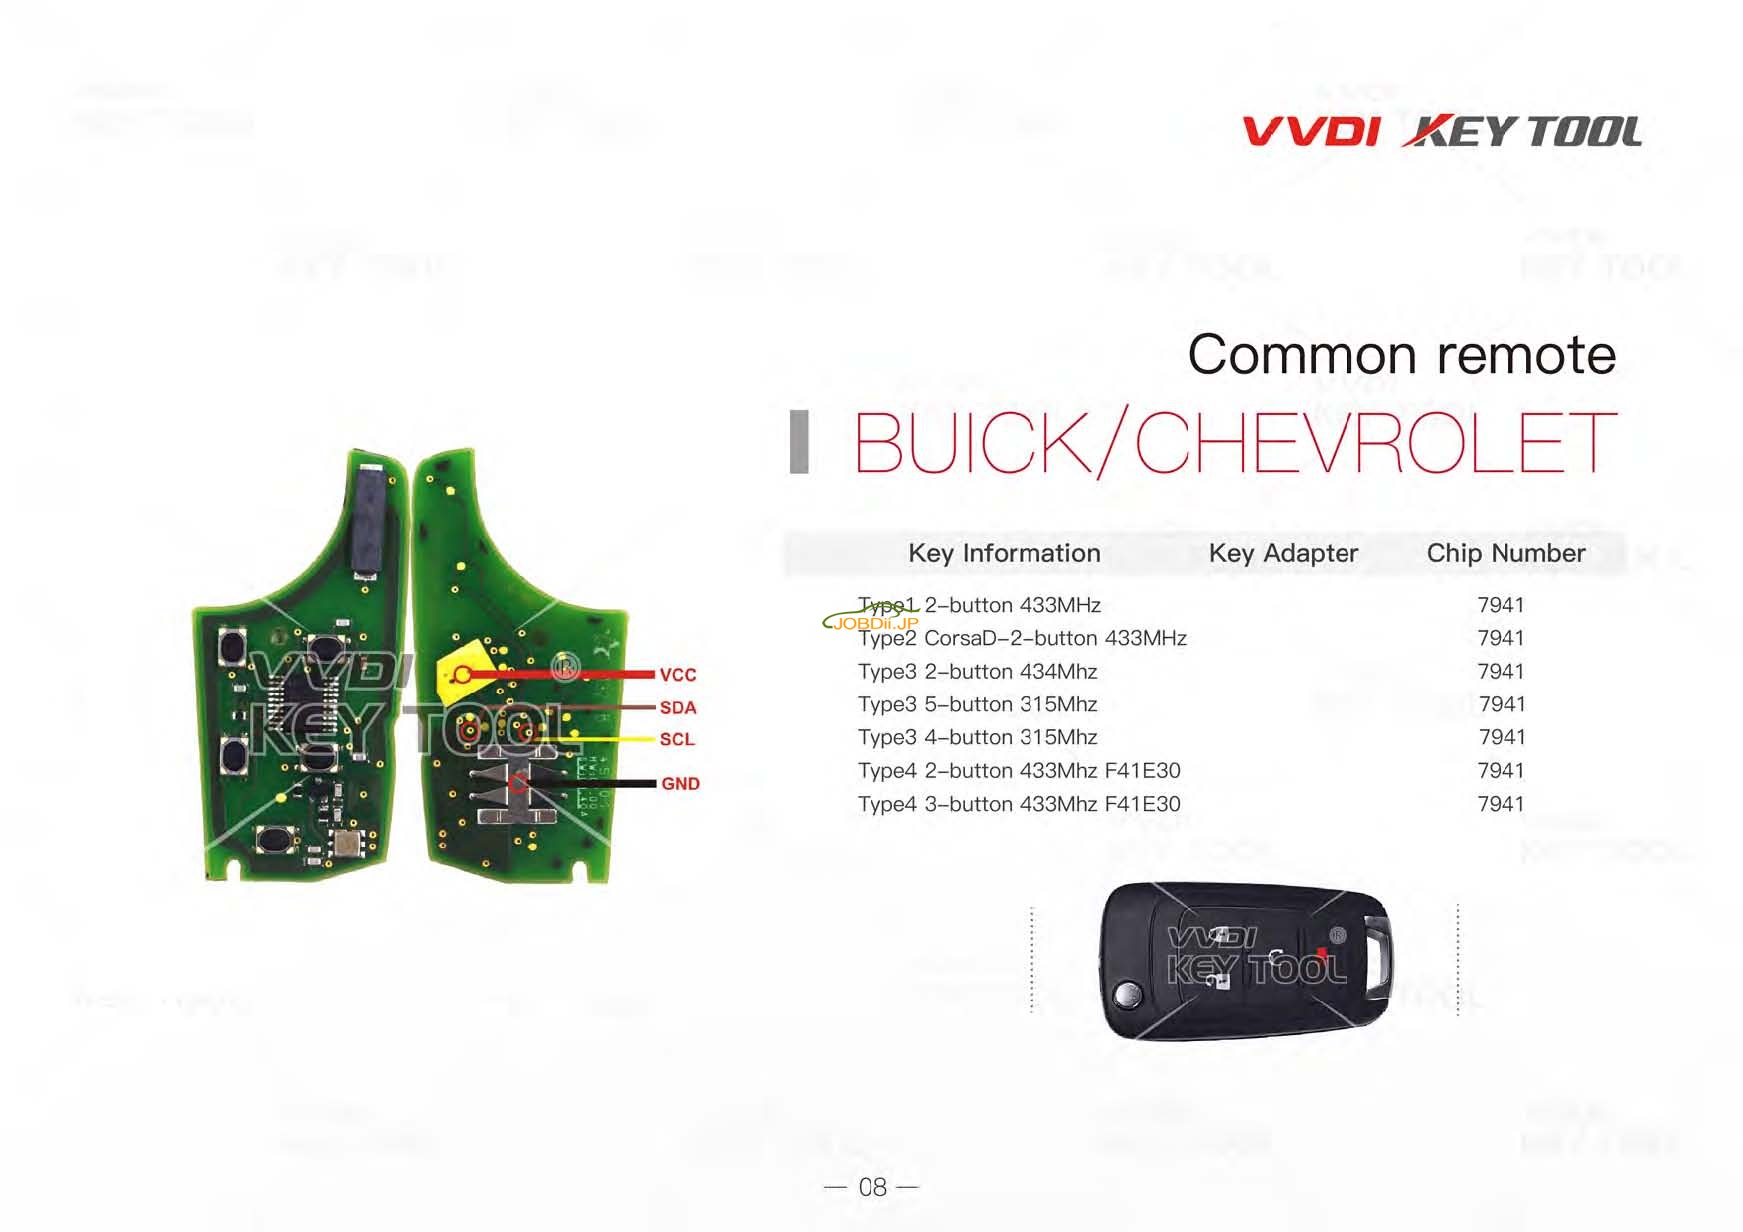 vvdi-key-tool-renew-diagram-08